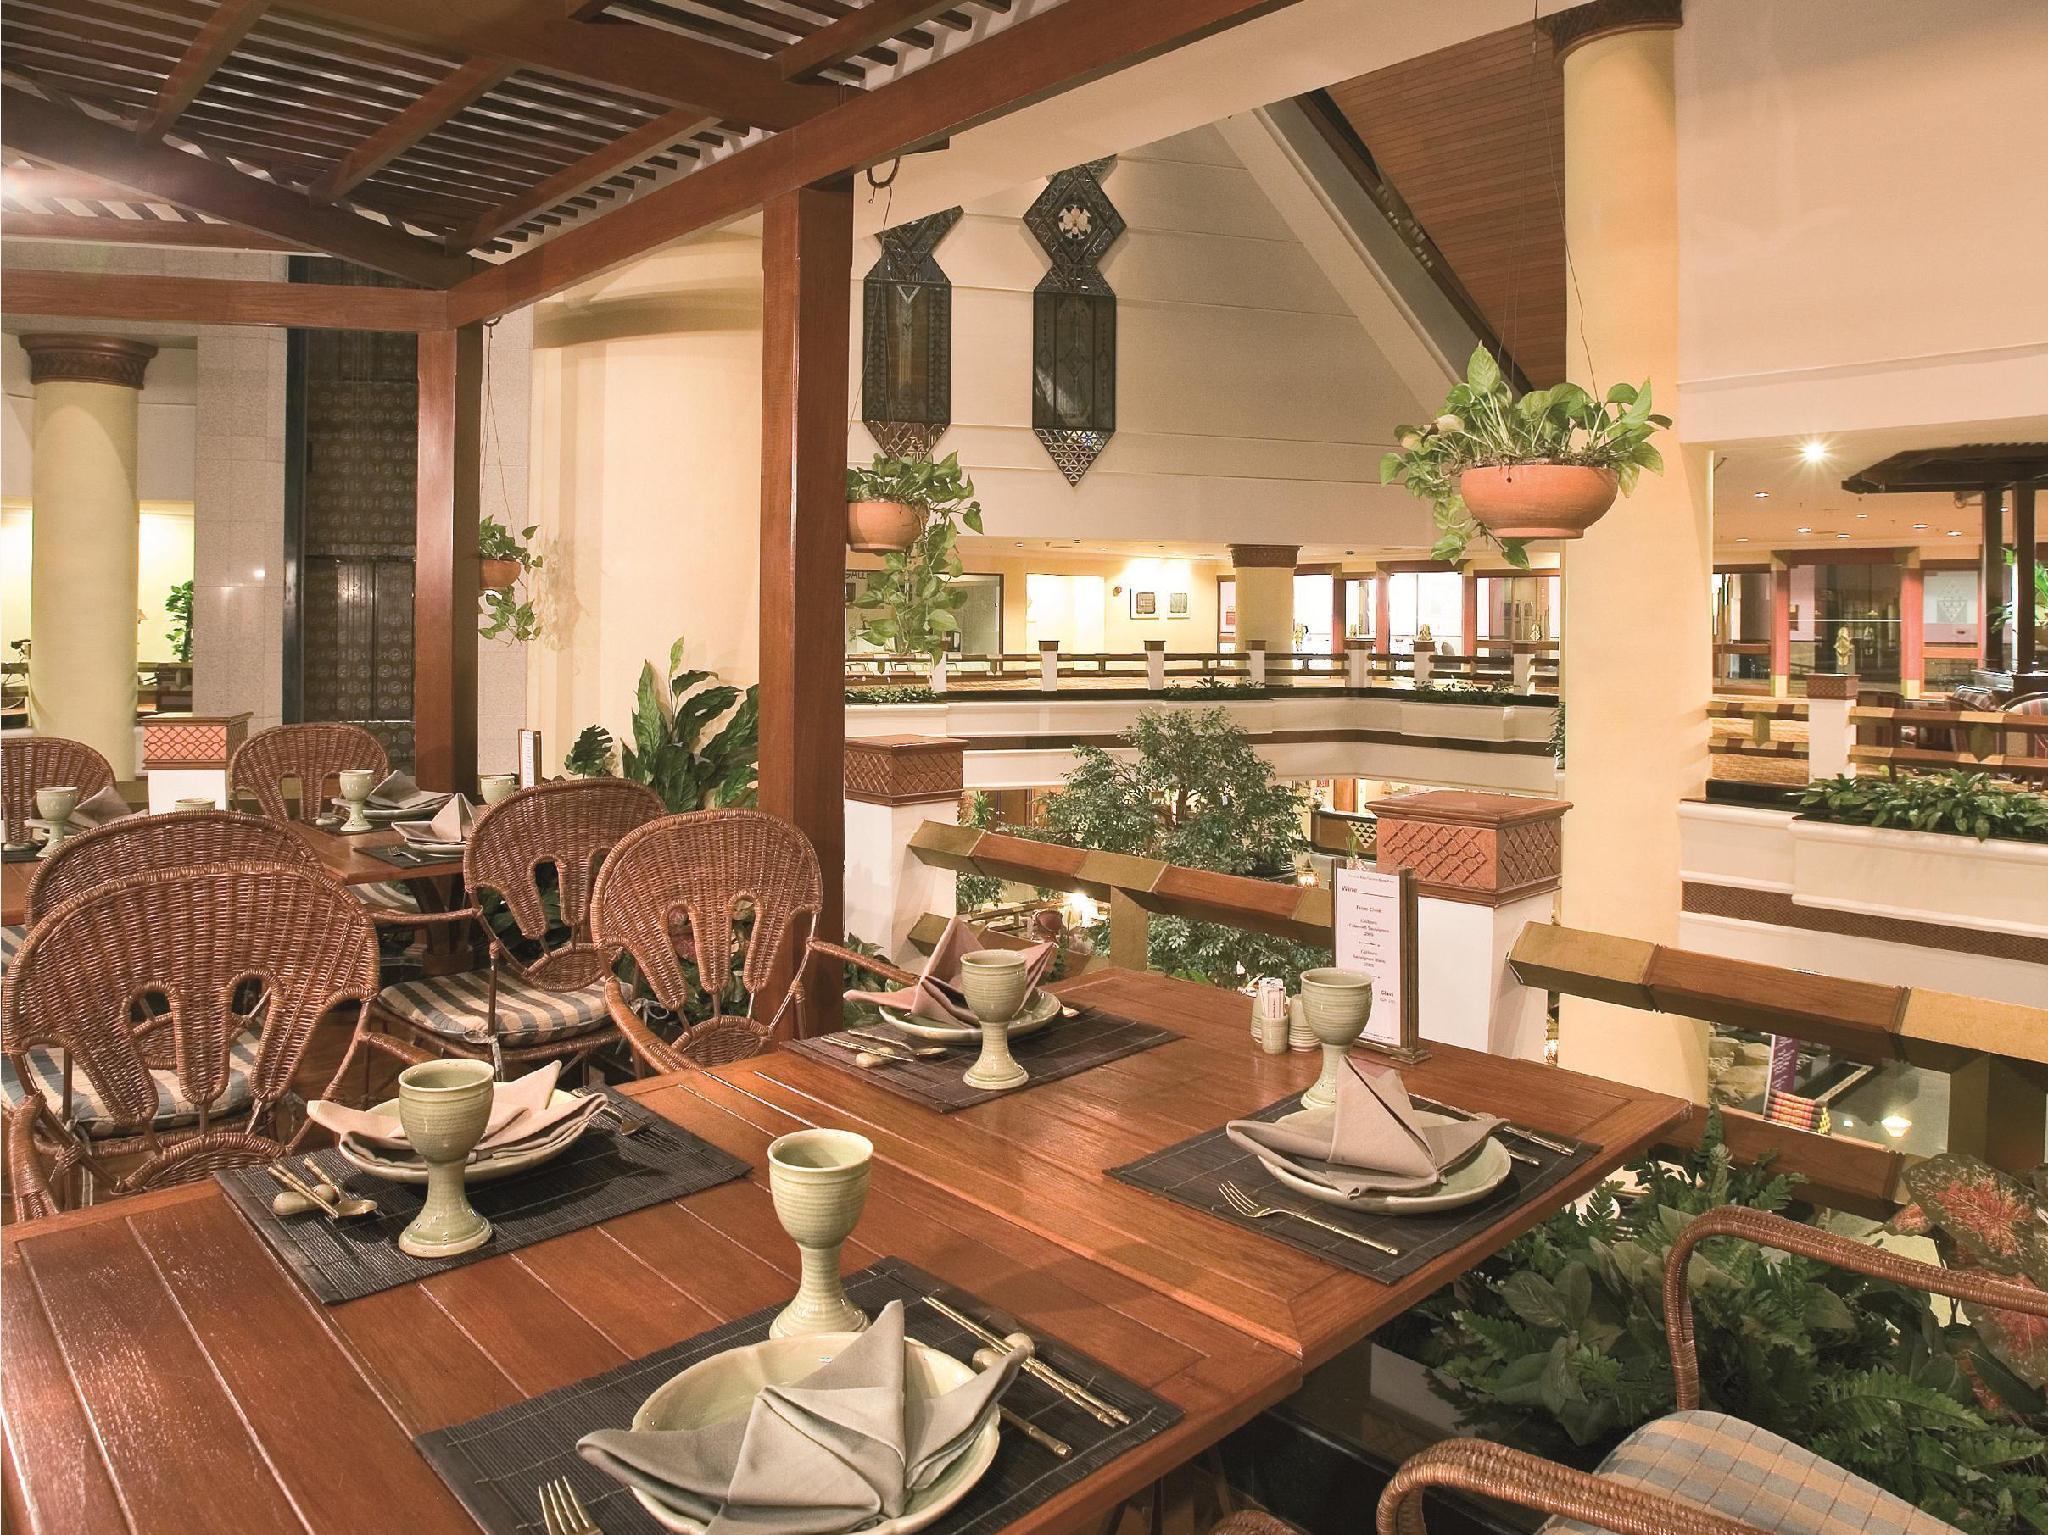 Pullman Khon Kaen Raja Orchid Hotel โรงแรมพูลแมน ขอนแก่น ราชา ออคิด